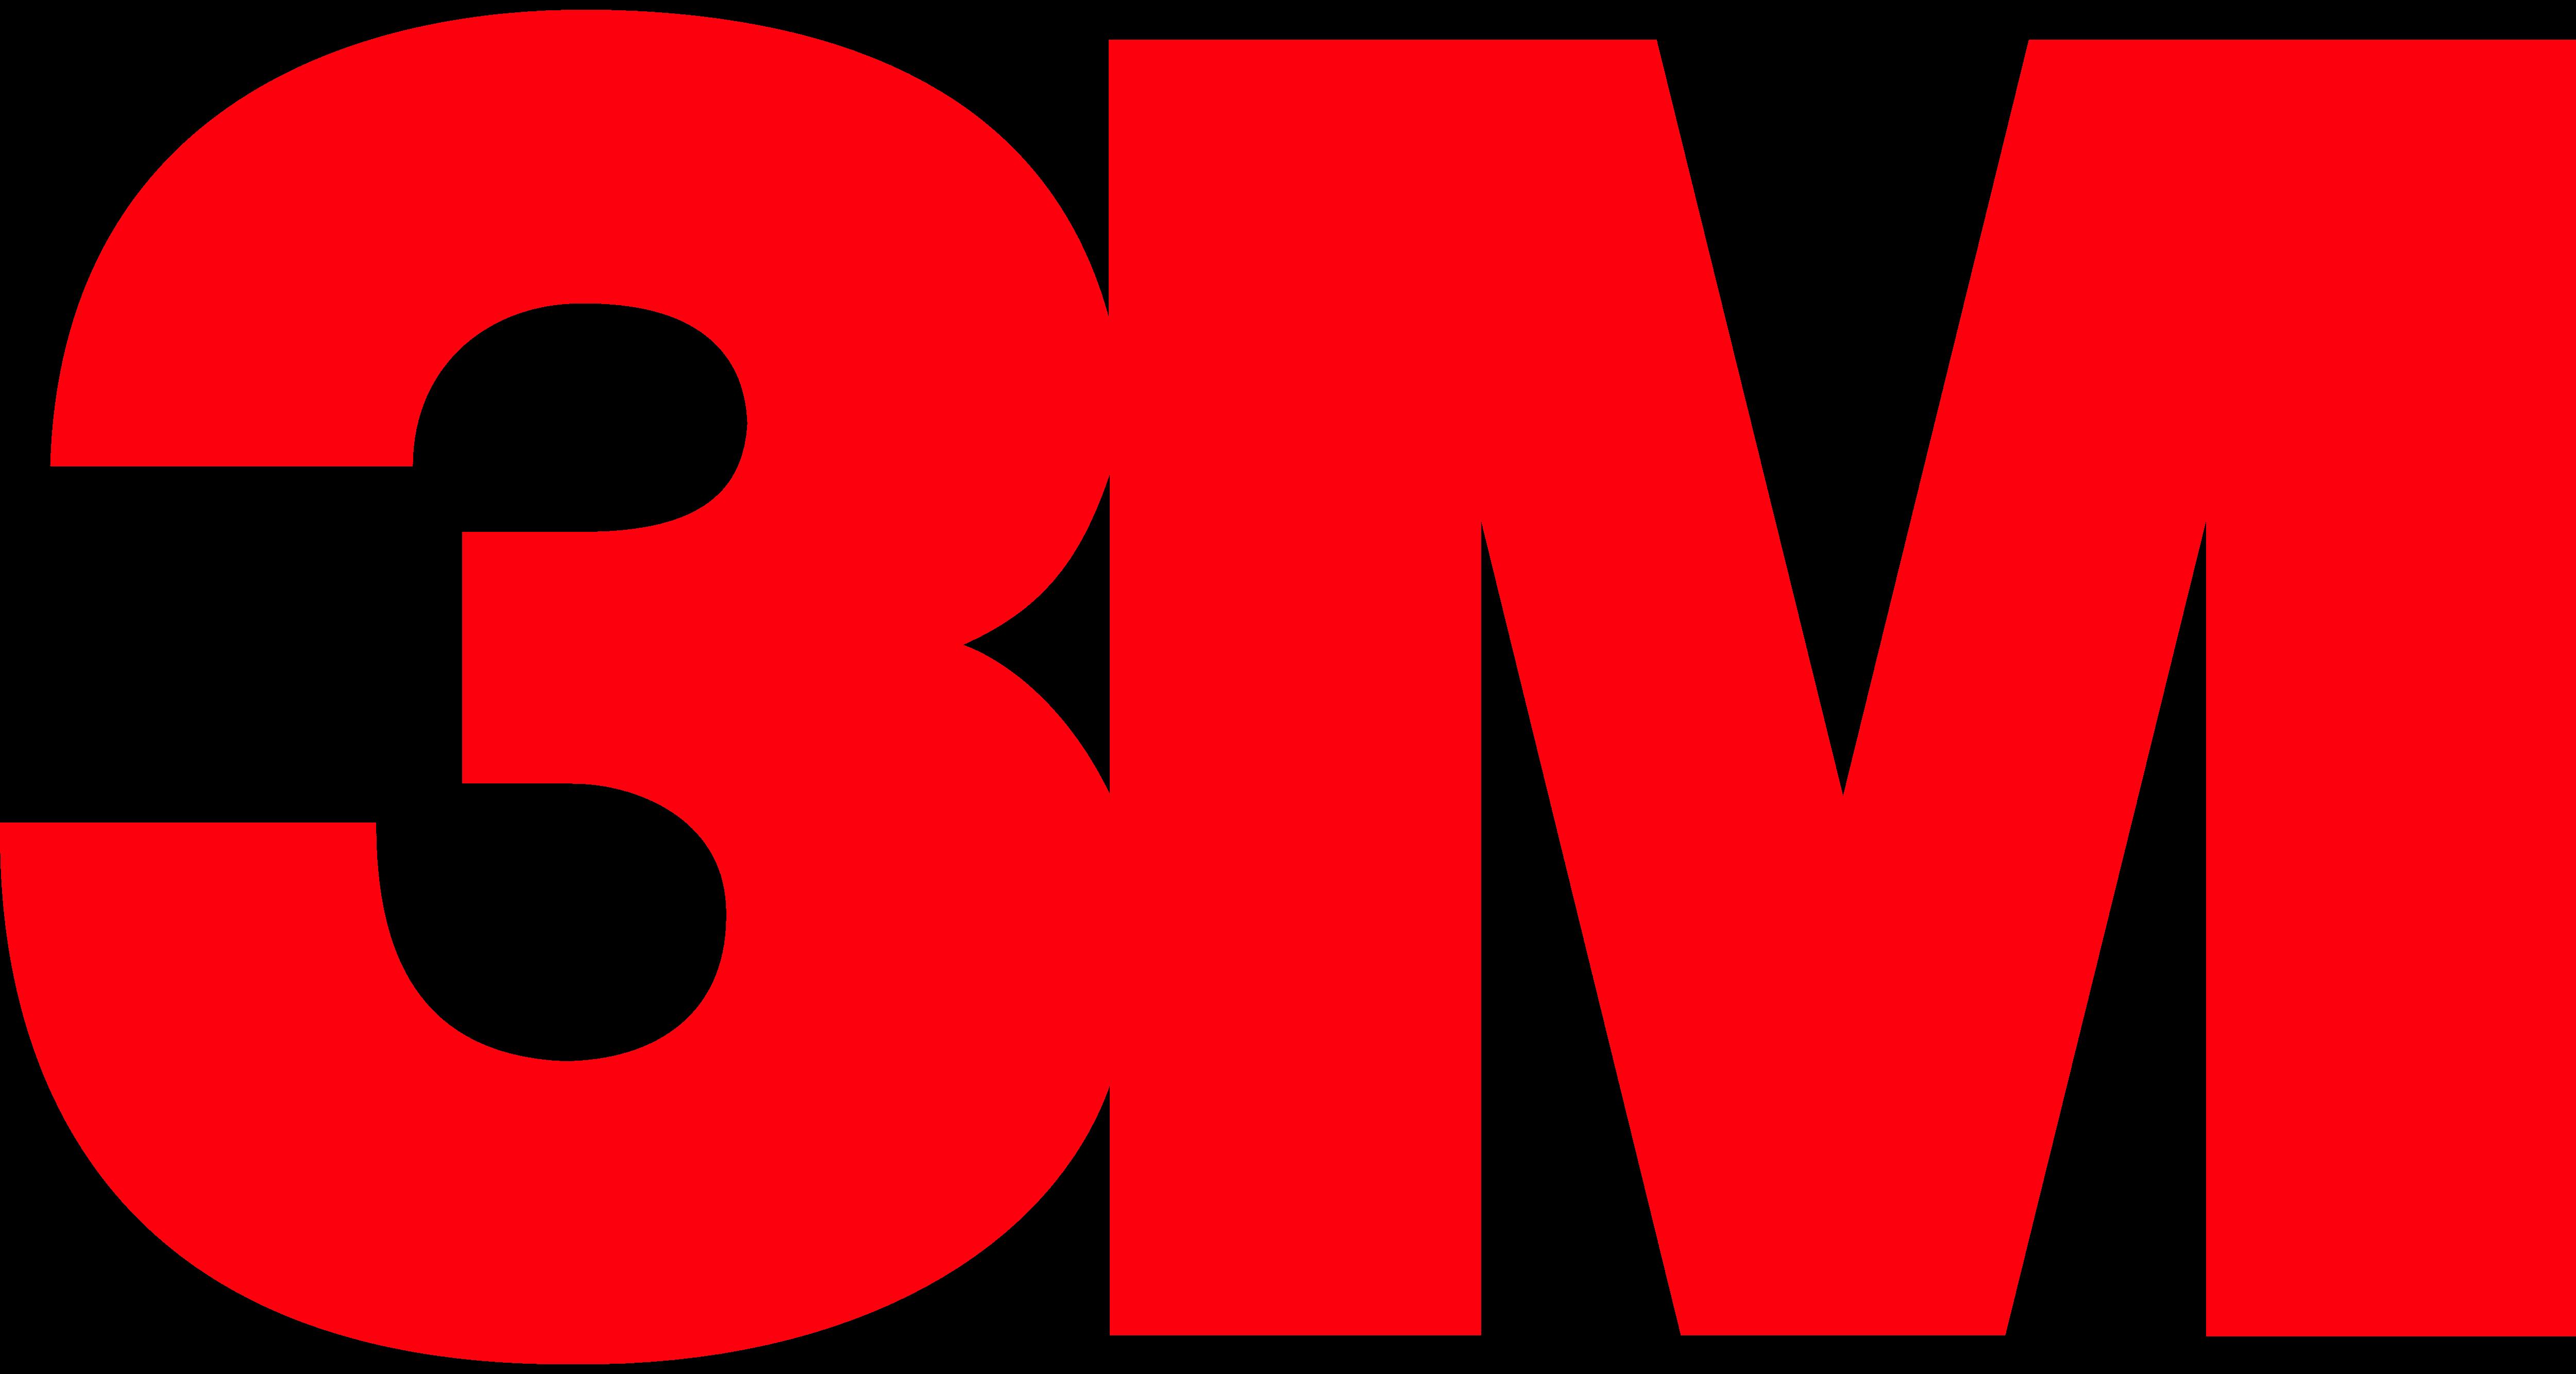 3m case study logo